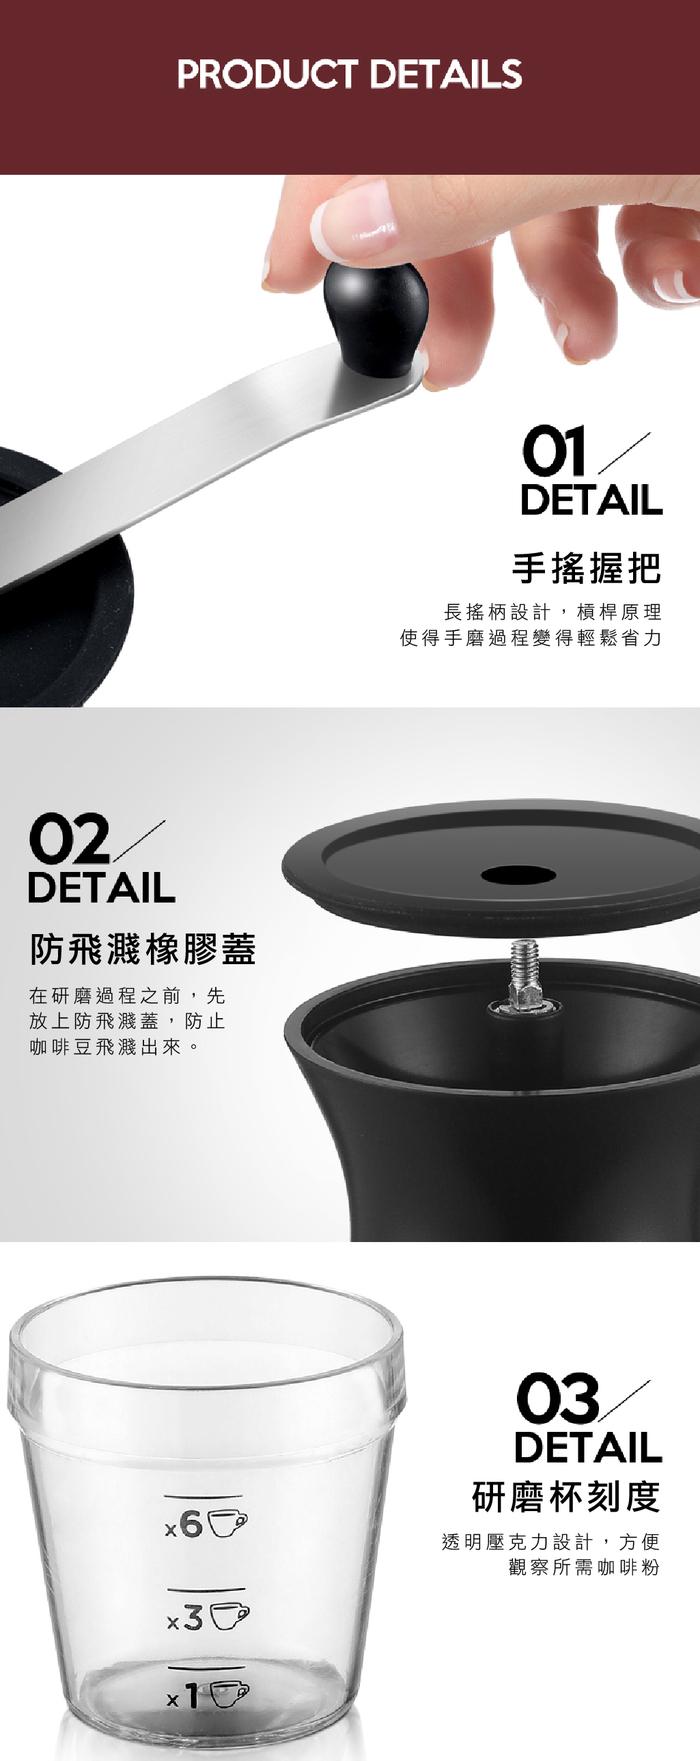 OSNER展悅國際 經典手搖磨豆機 KDL-903